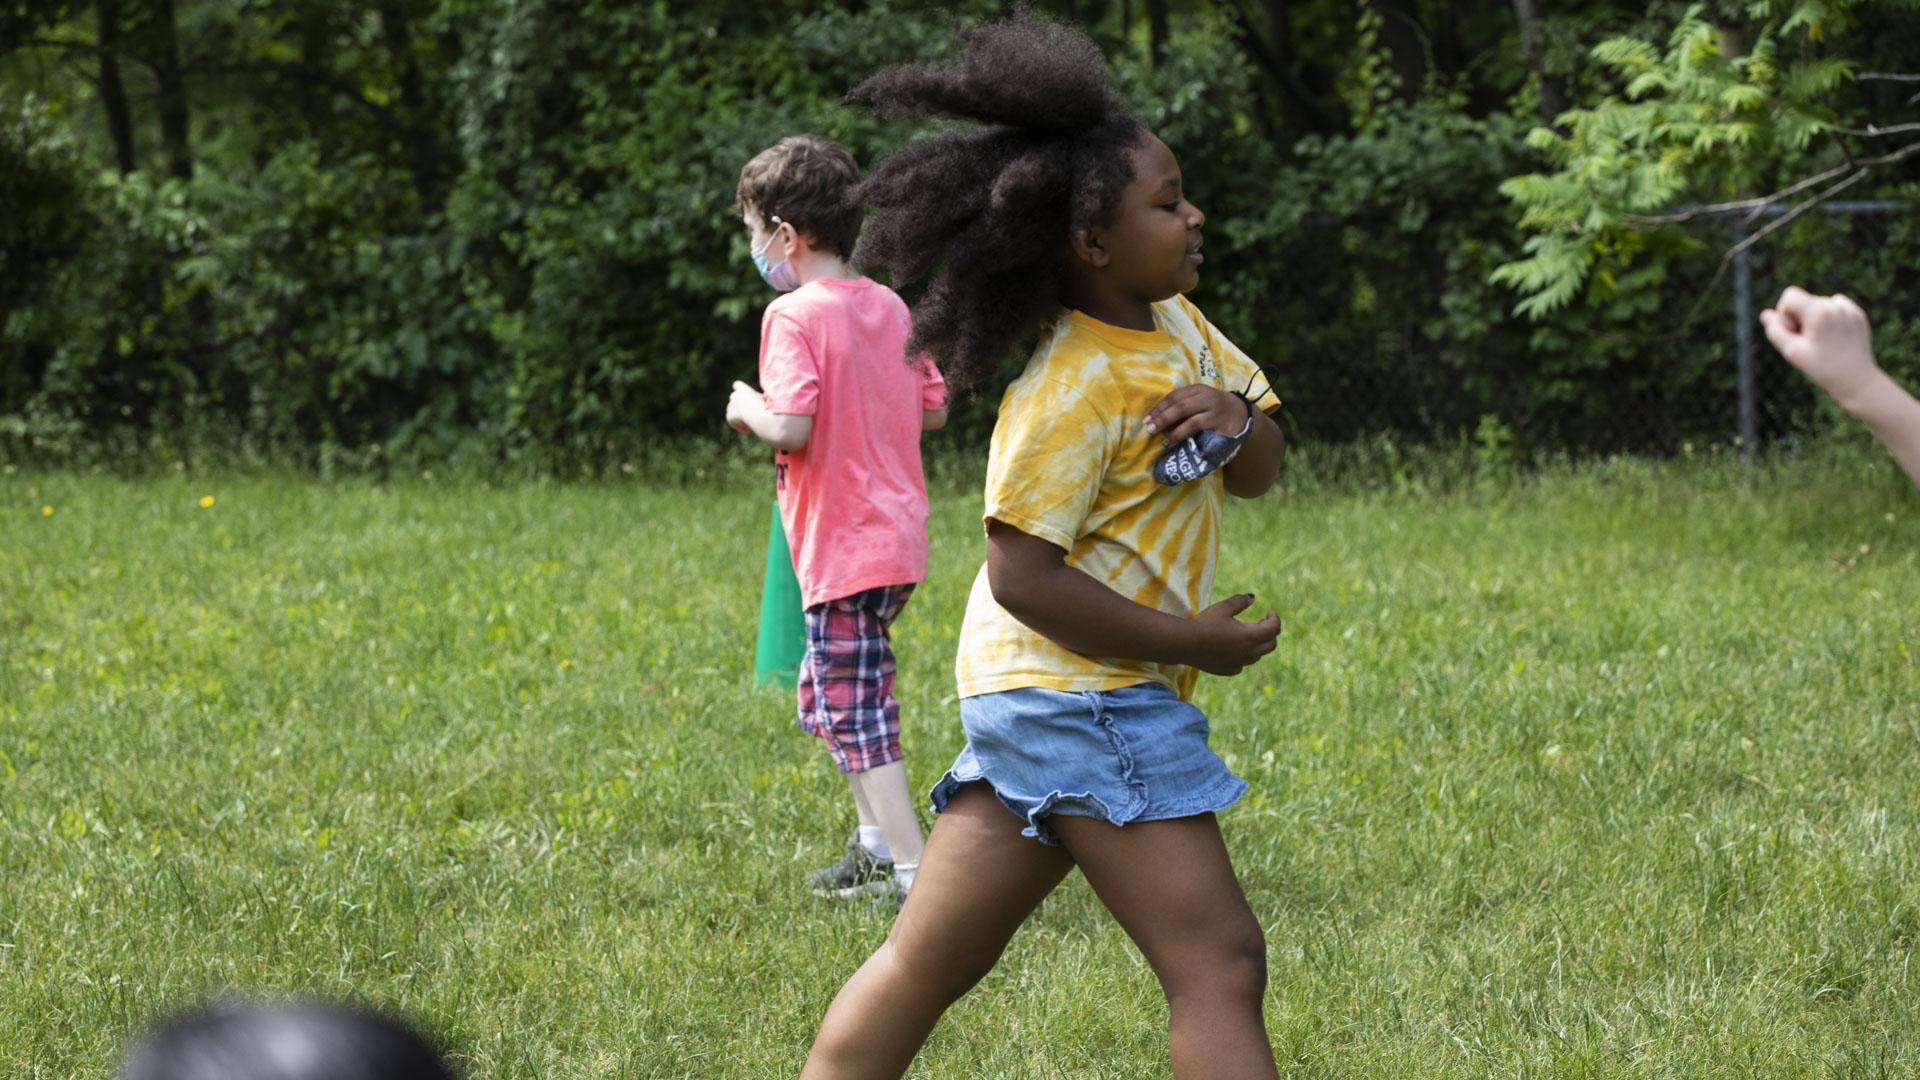 Student running in grass